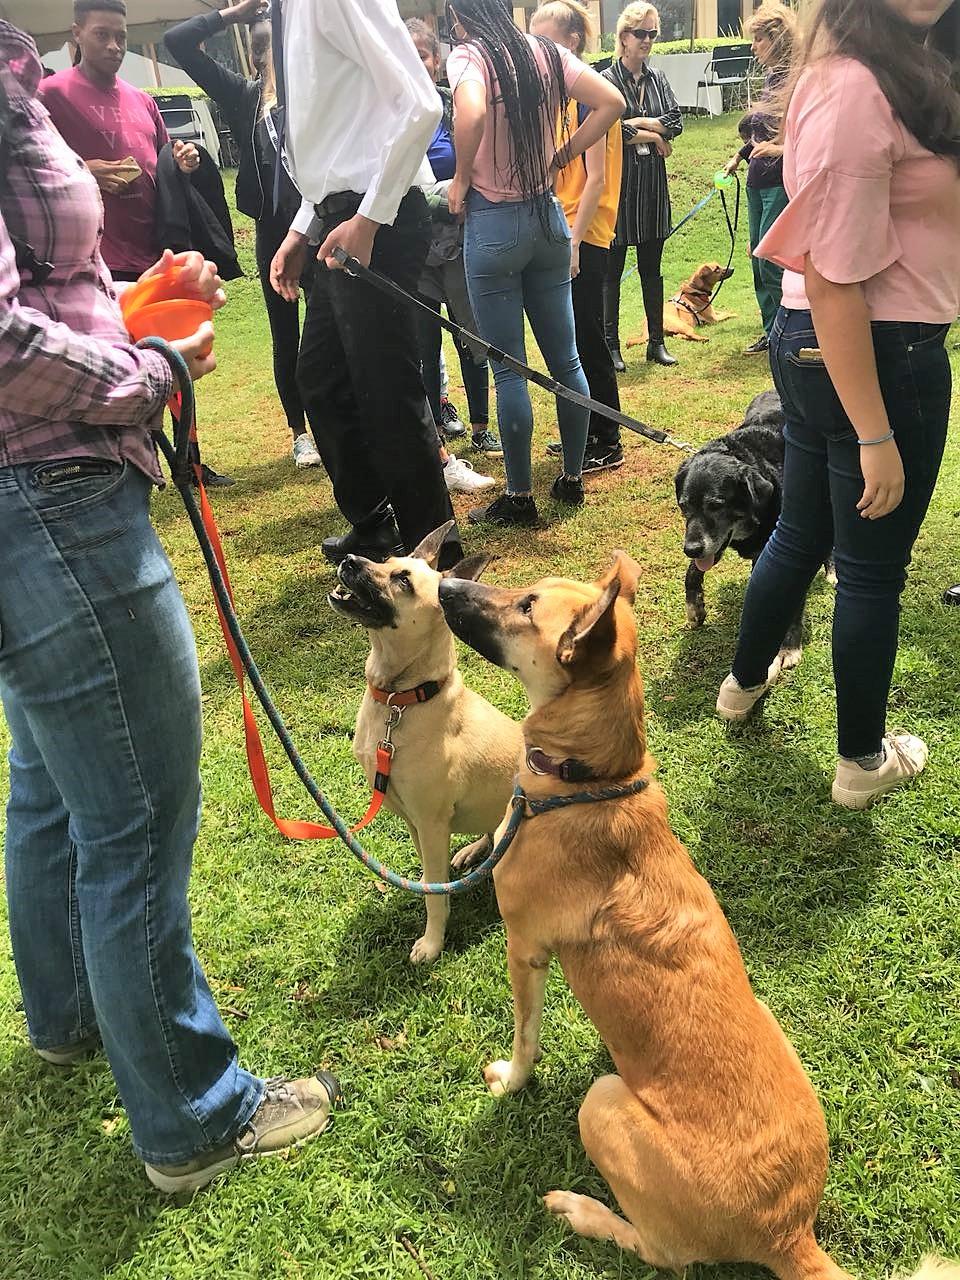 Pinda and Korneel in full anticipation of treats. Korneel was adopted from TNR Trust